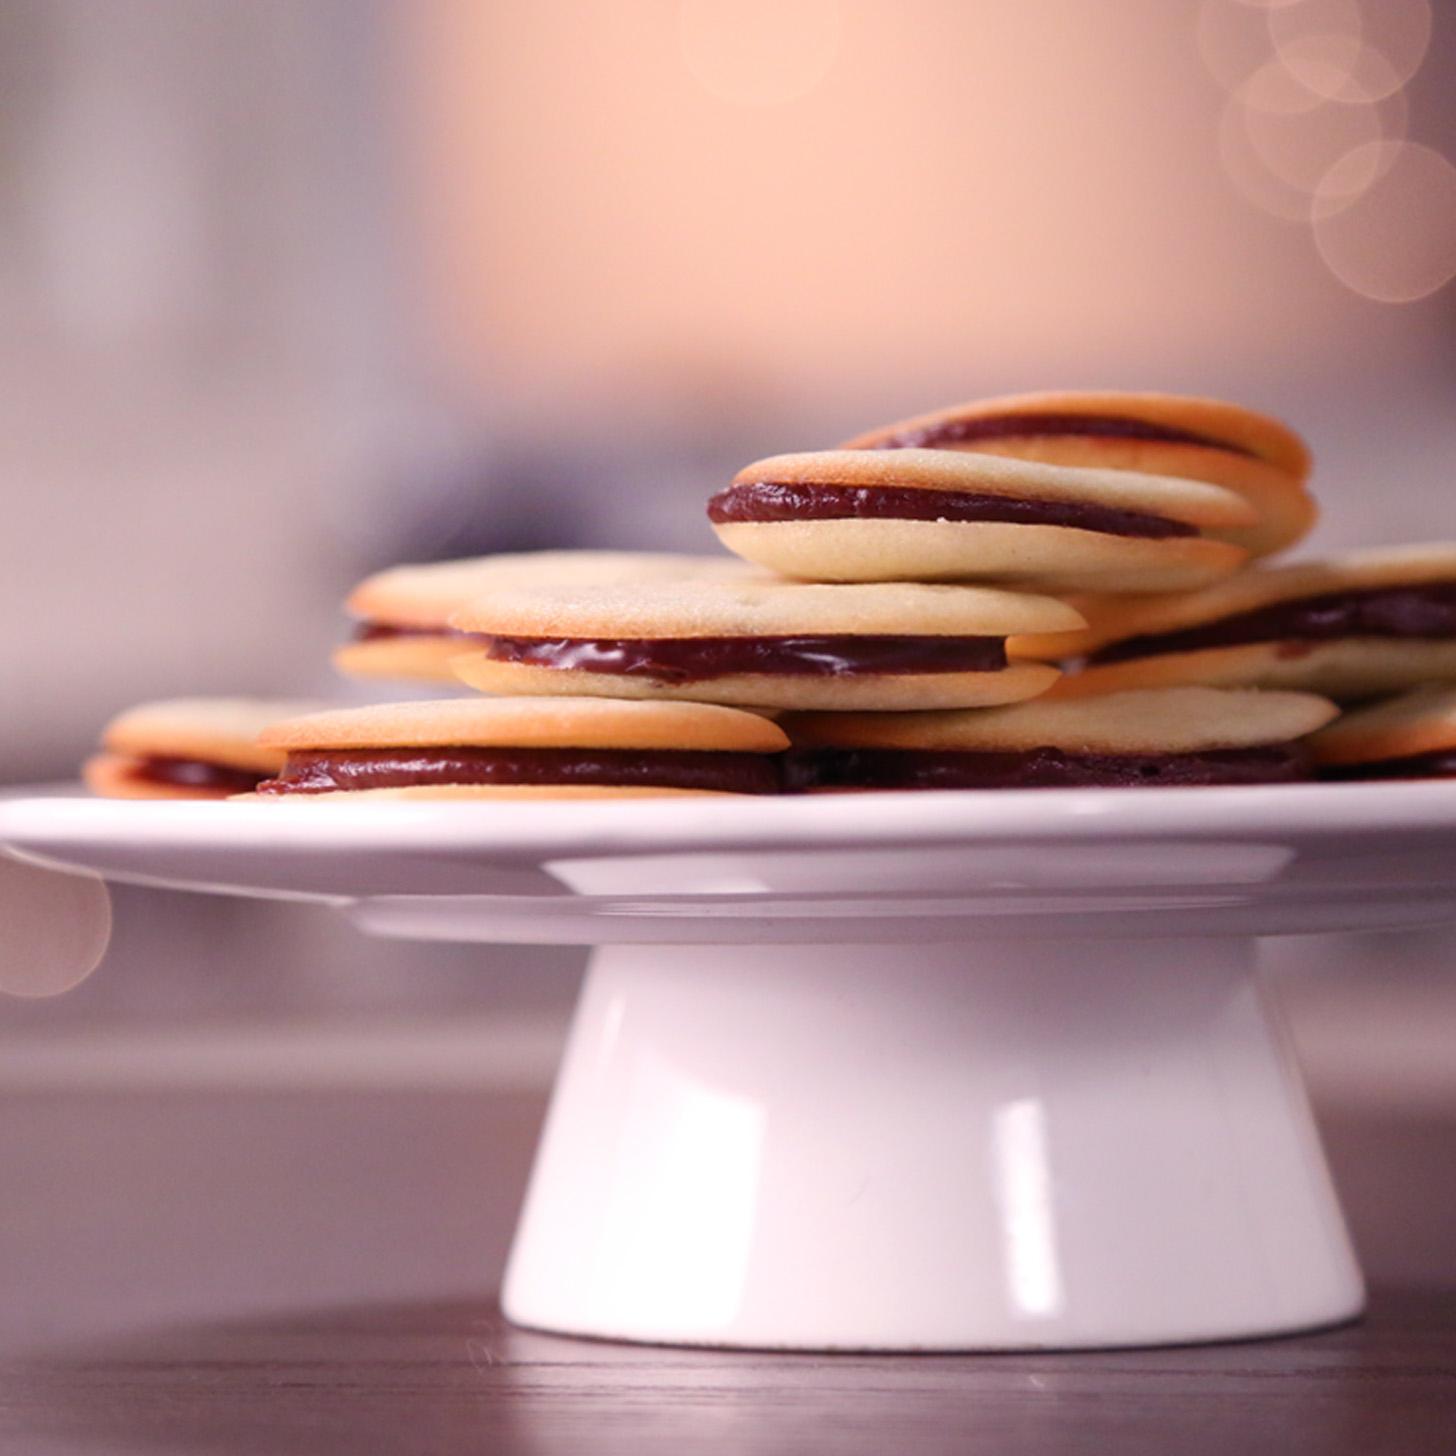 Homemade Milano Cookie Recipe | POPSUGAR Food